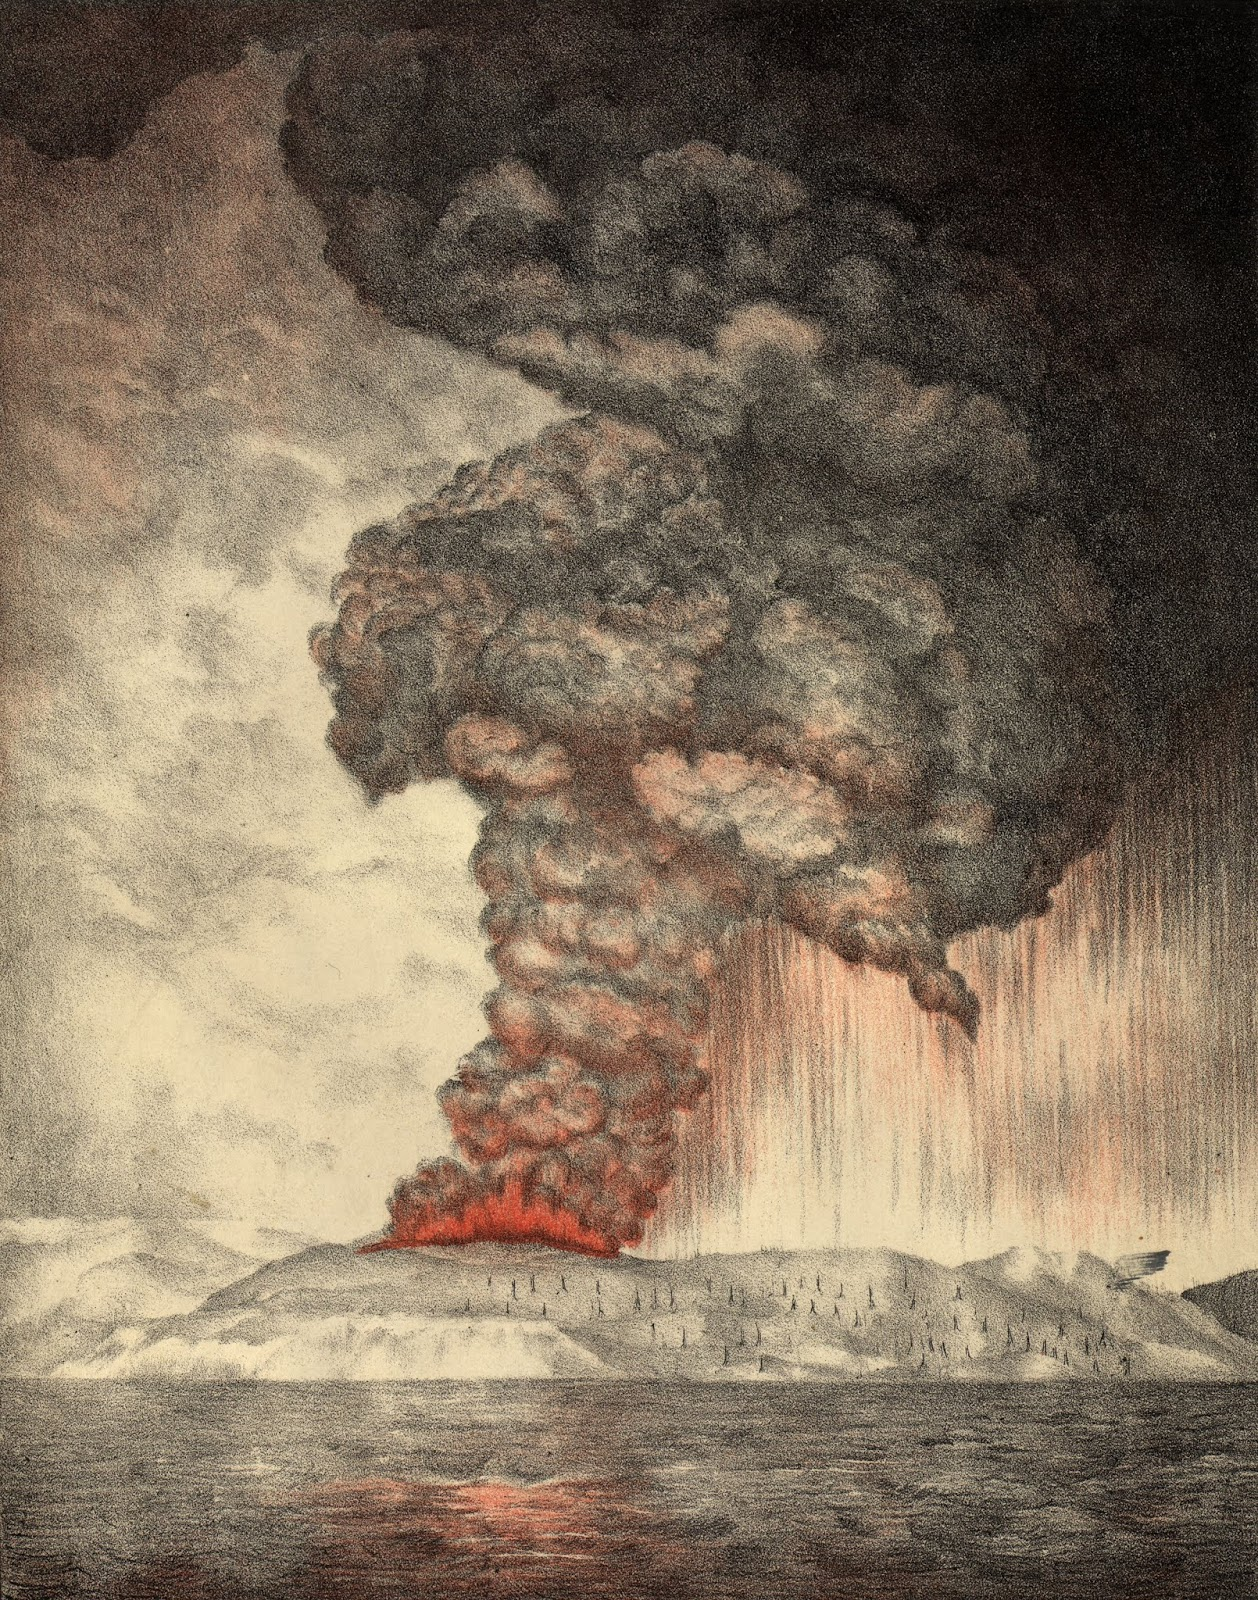 Bentuk Ekstrusi Magma : bentuk, ekstrusi, magma, Bentuk, Ekstrusi, (Erupsi), Magma, Berdasarkan, Sifat, Bentuknya, Lengkap, Gambar, Penjelasan, MARKIJAR.Com